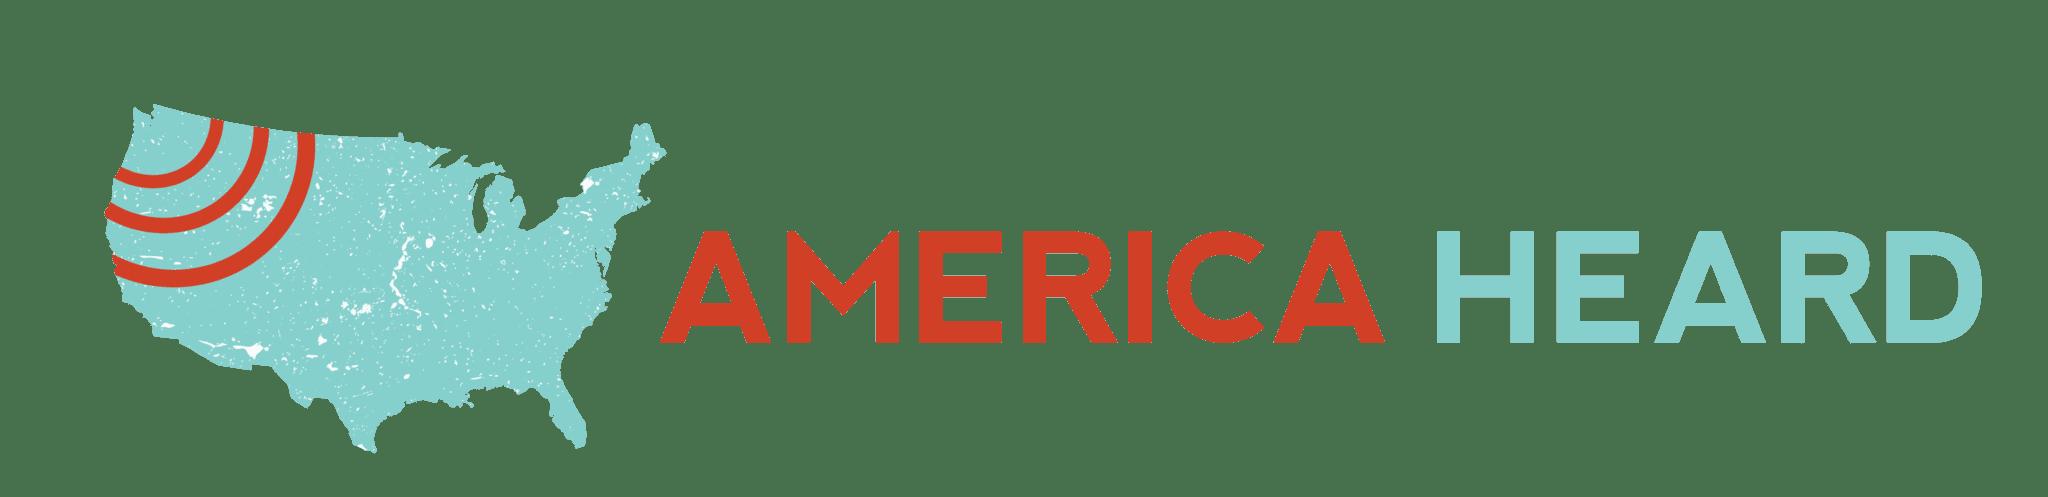 American heard logo